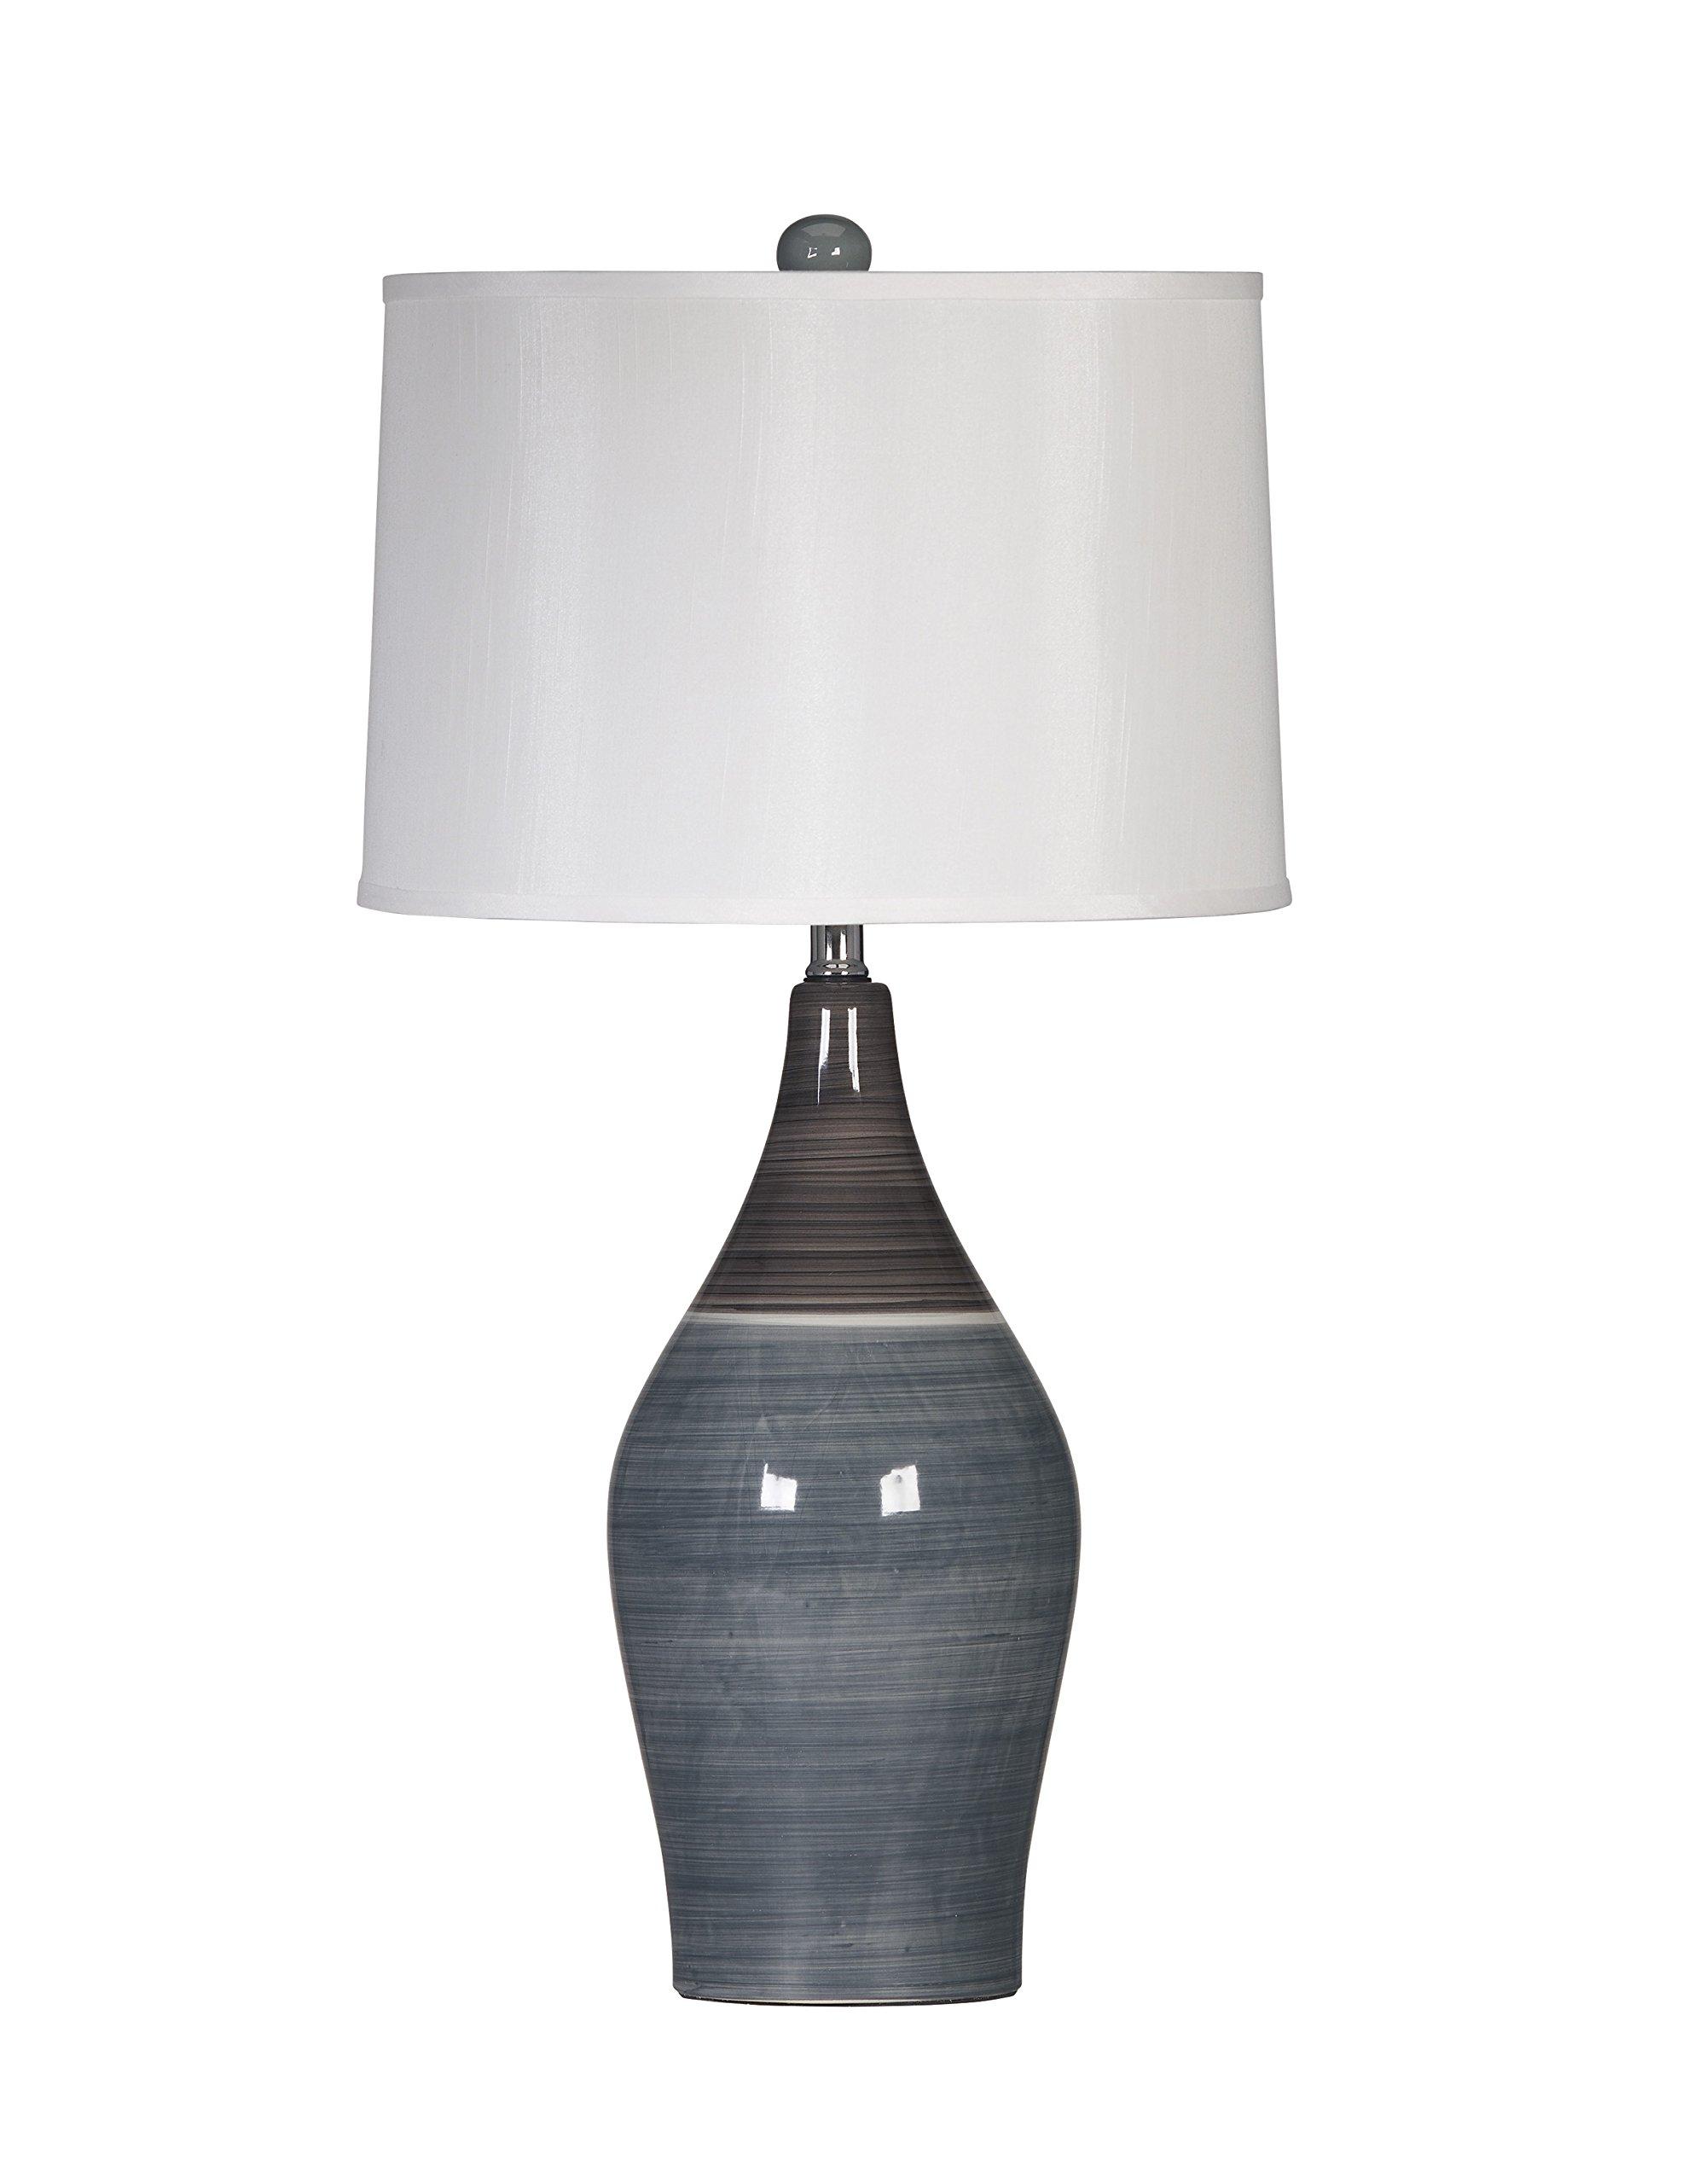 Ashley Furniture Signature Design -  Niobe Ceramic Table Lamp - Set of 2 - Multicolored/Gray by Signature Design by Ashley (Image #2)